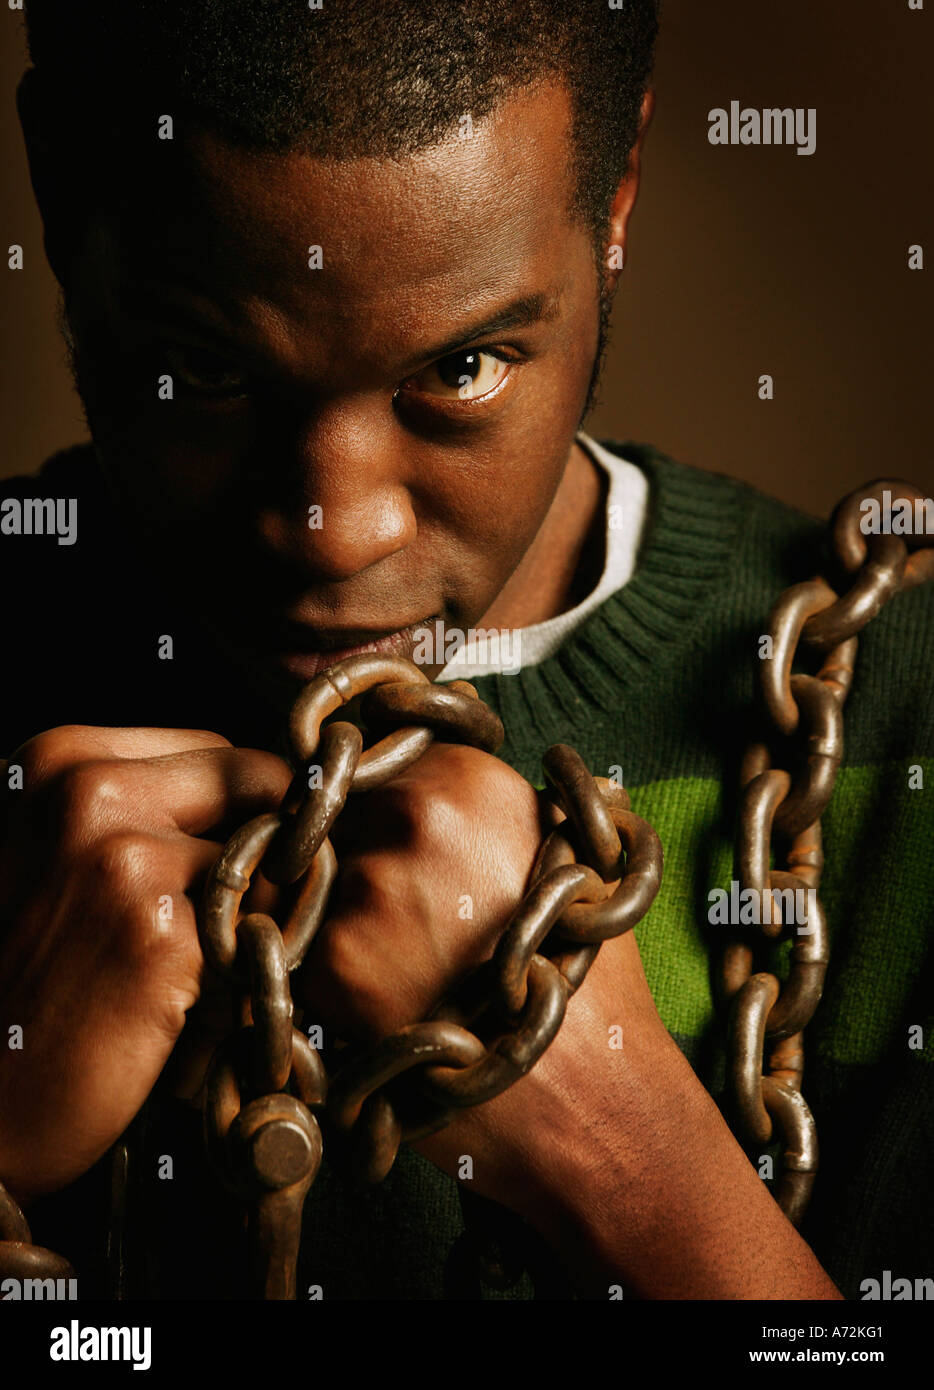 Man in Bondage - Stock Image